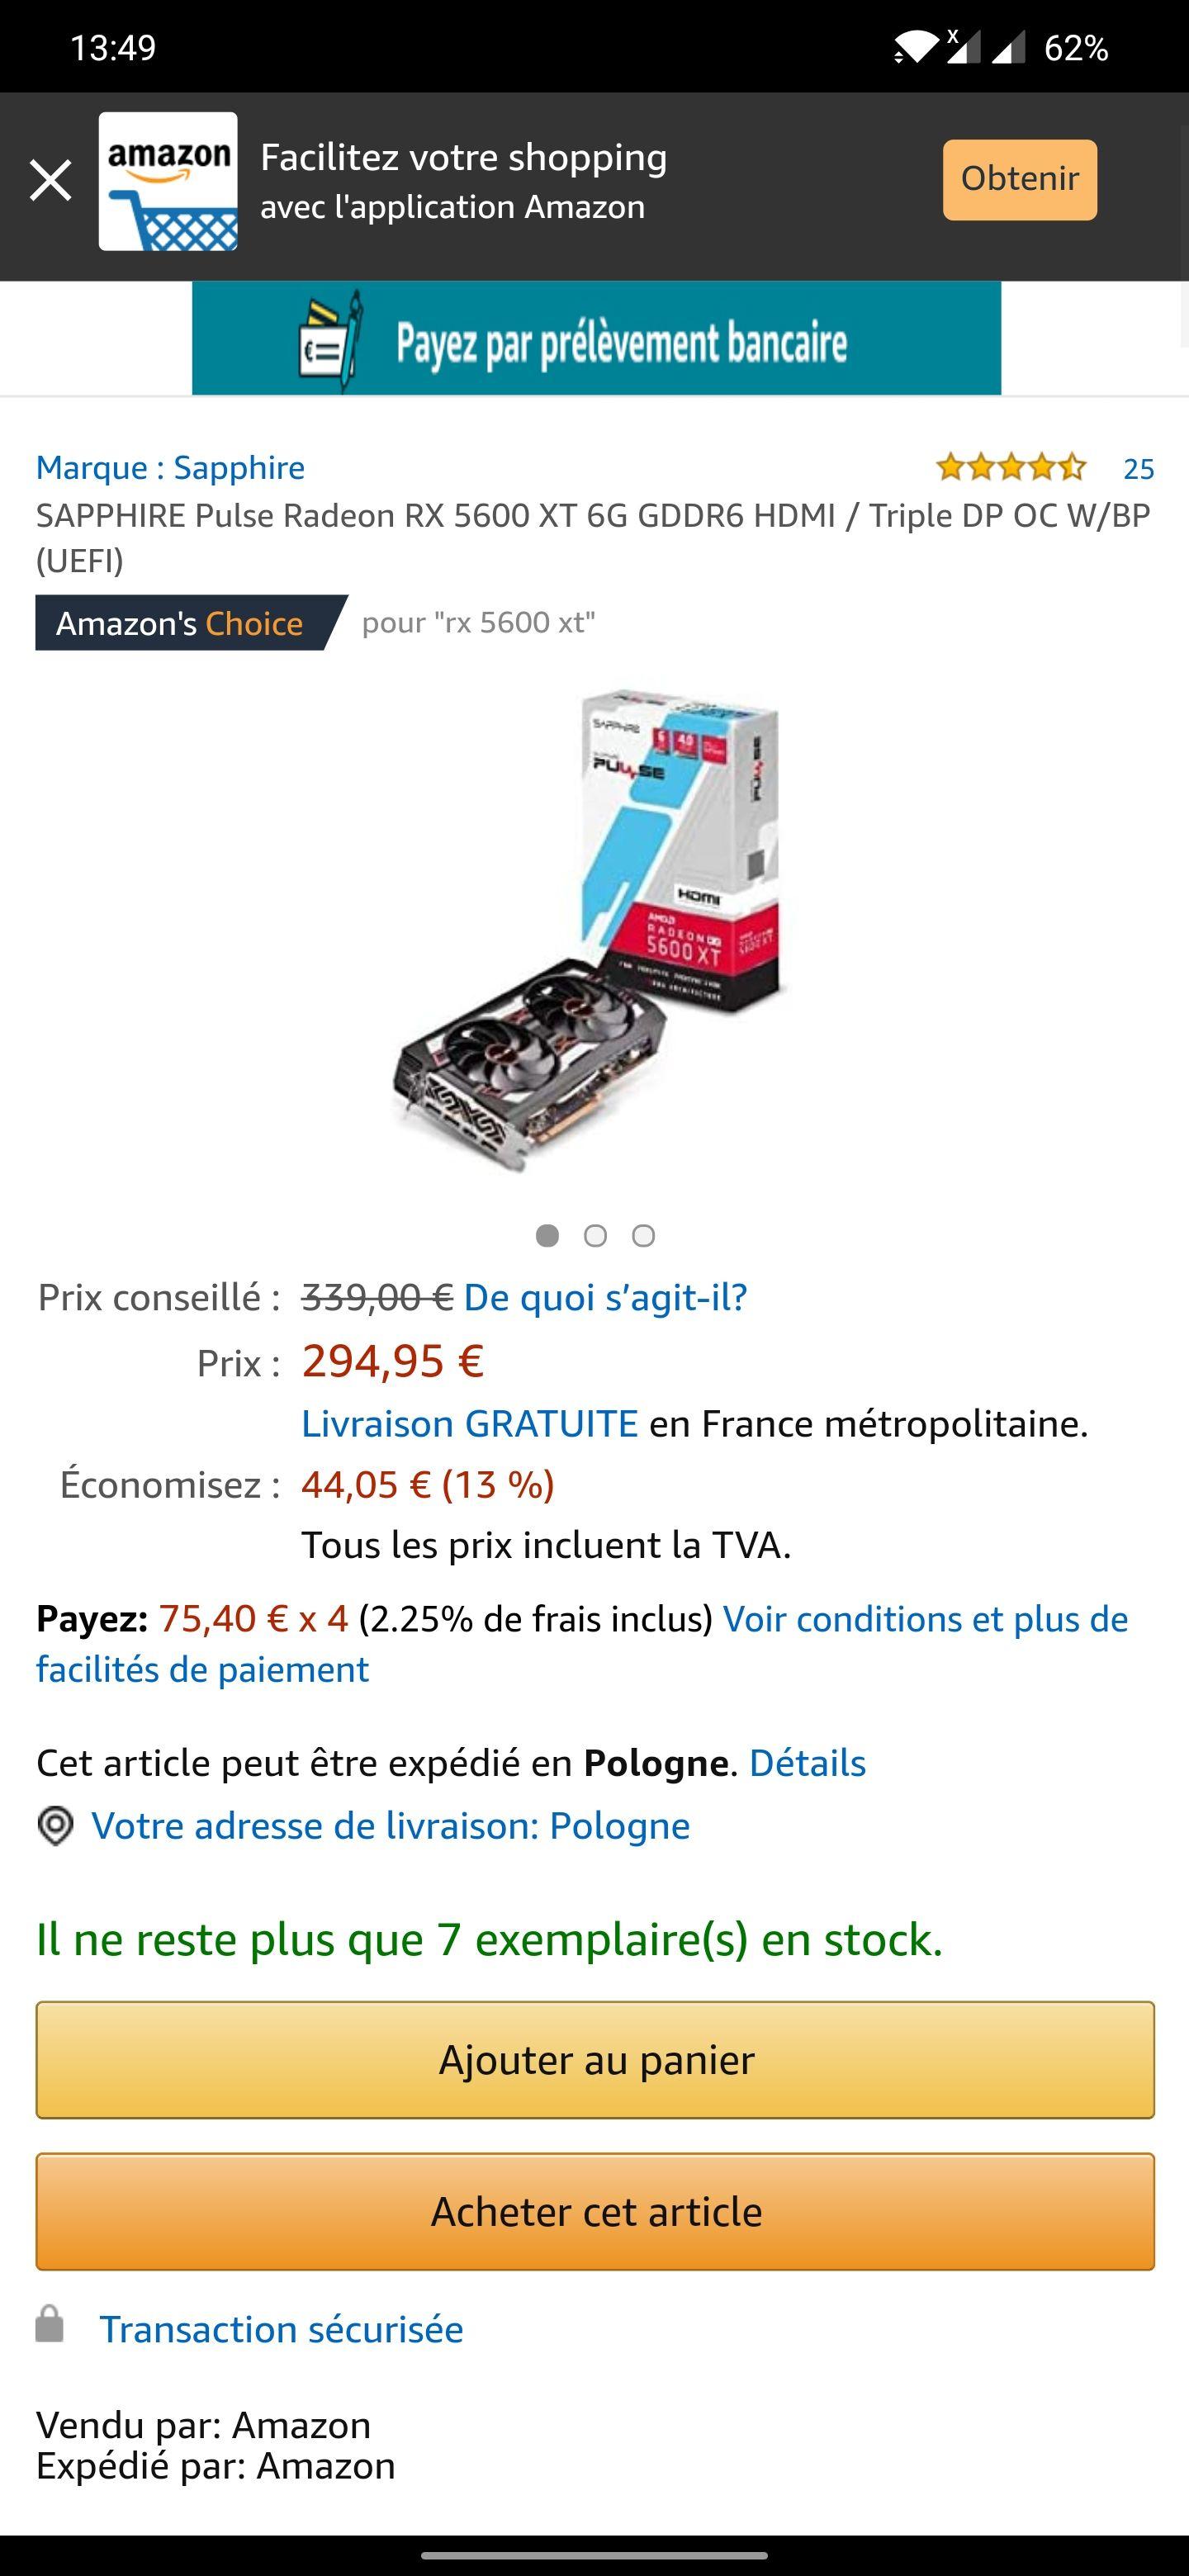 SAPPHIRE Pulse Radeon RX 5600 XT (€295)